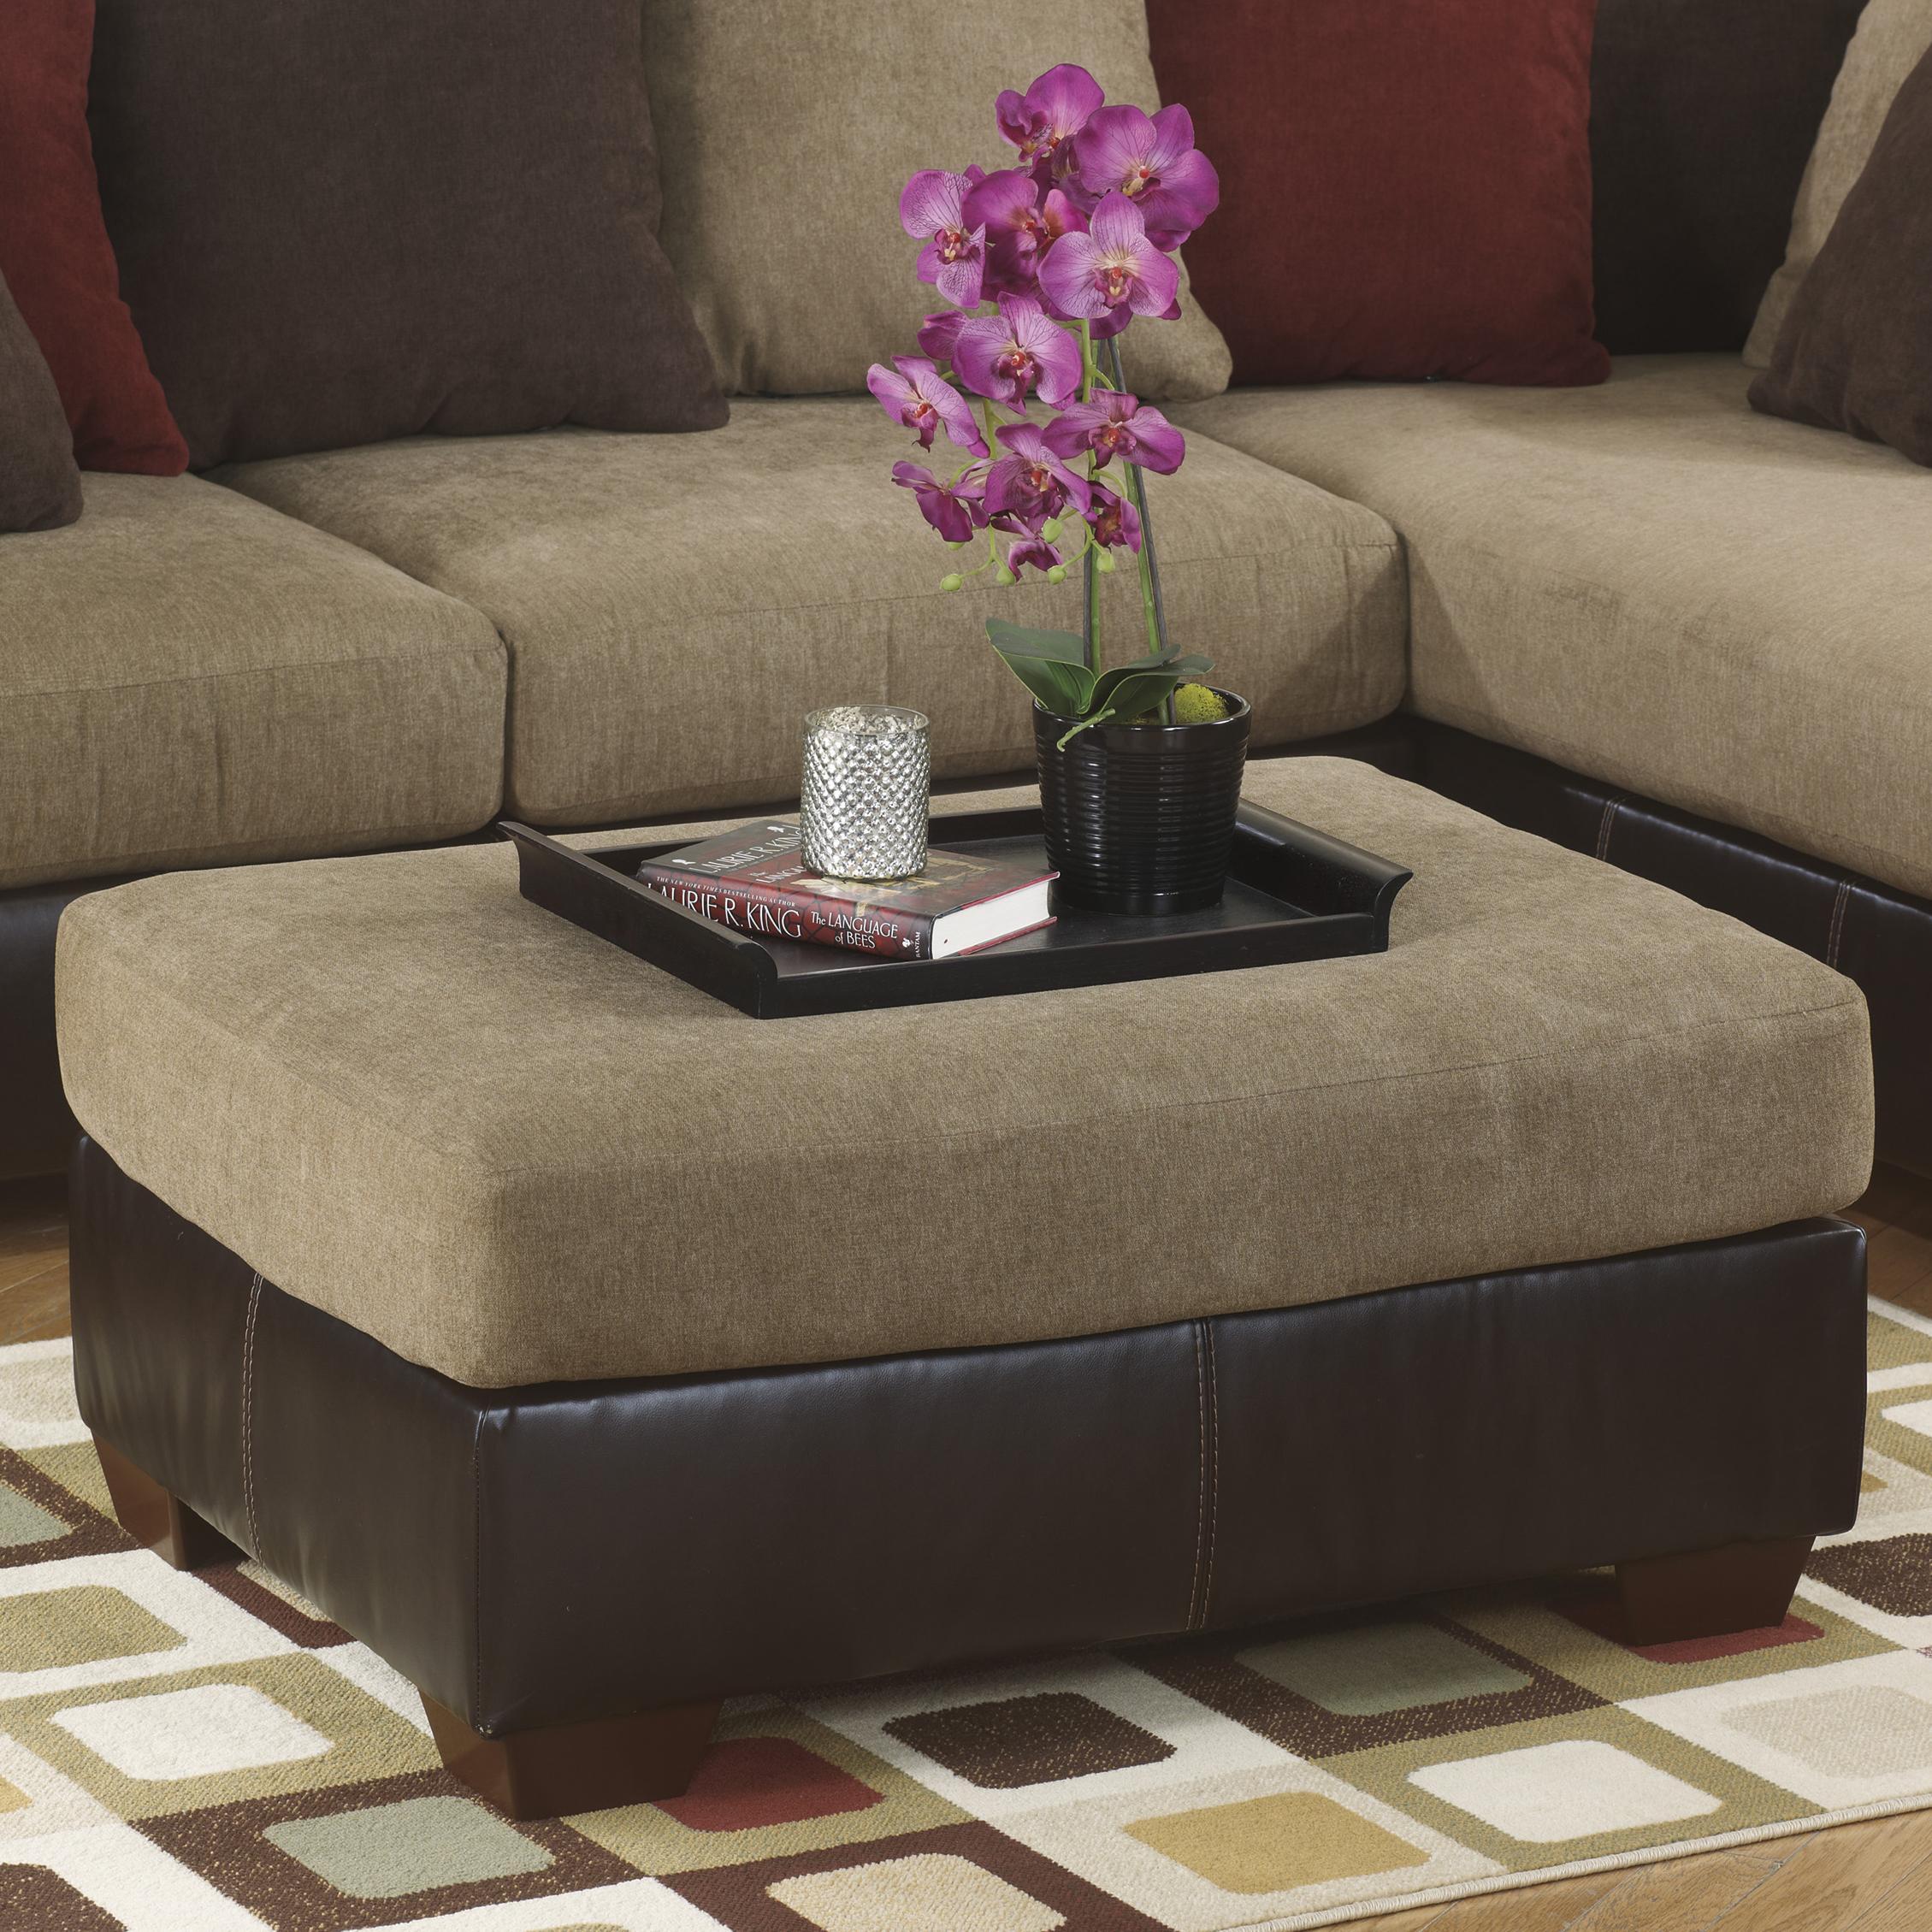 Ashley Furniture Sanya - Mocha Oversized Accent Ottoman - Item Number: 2840008